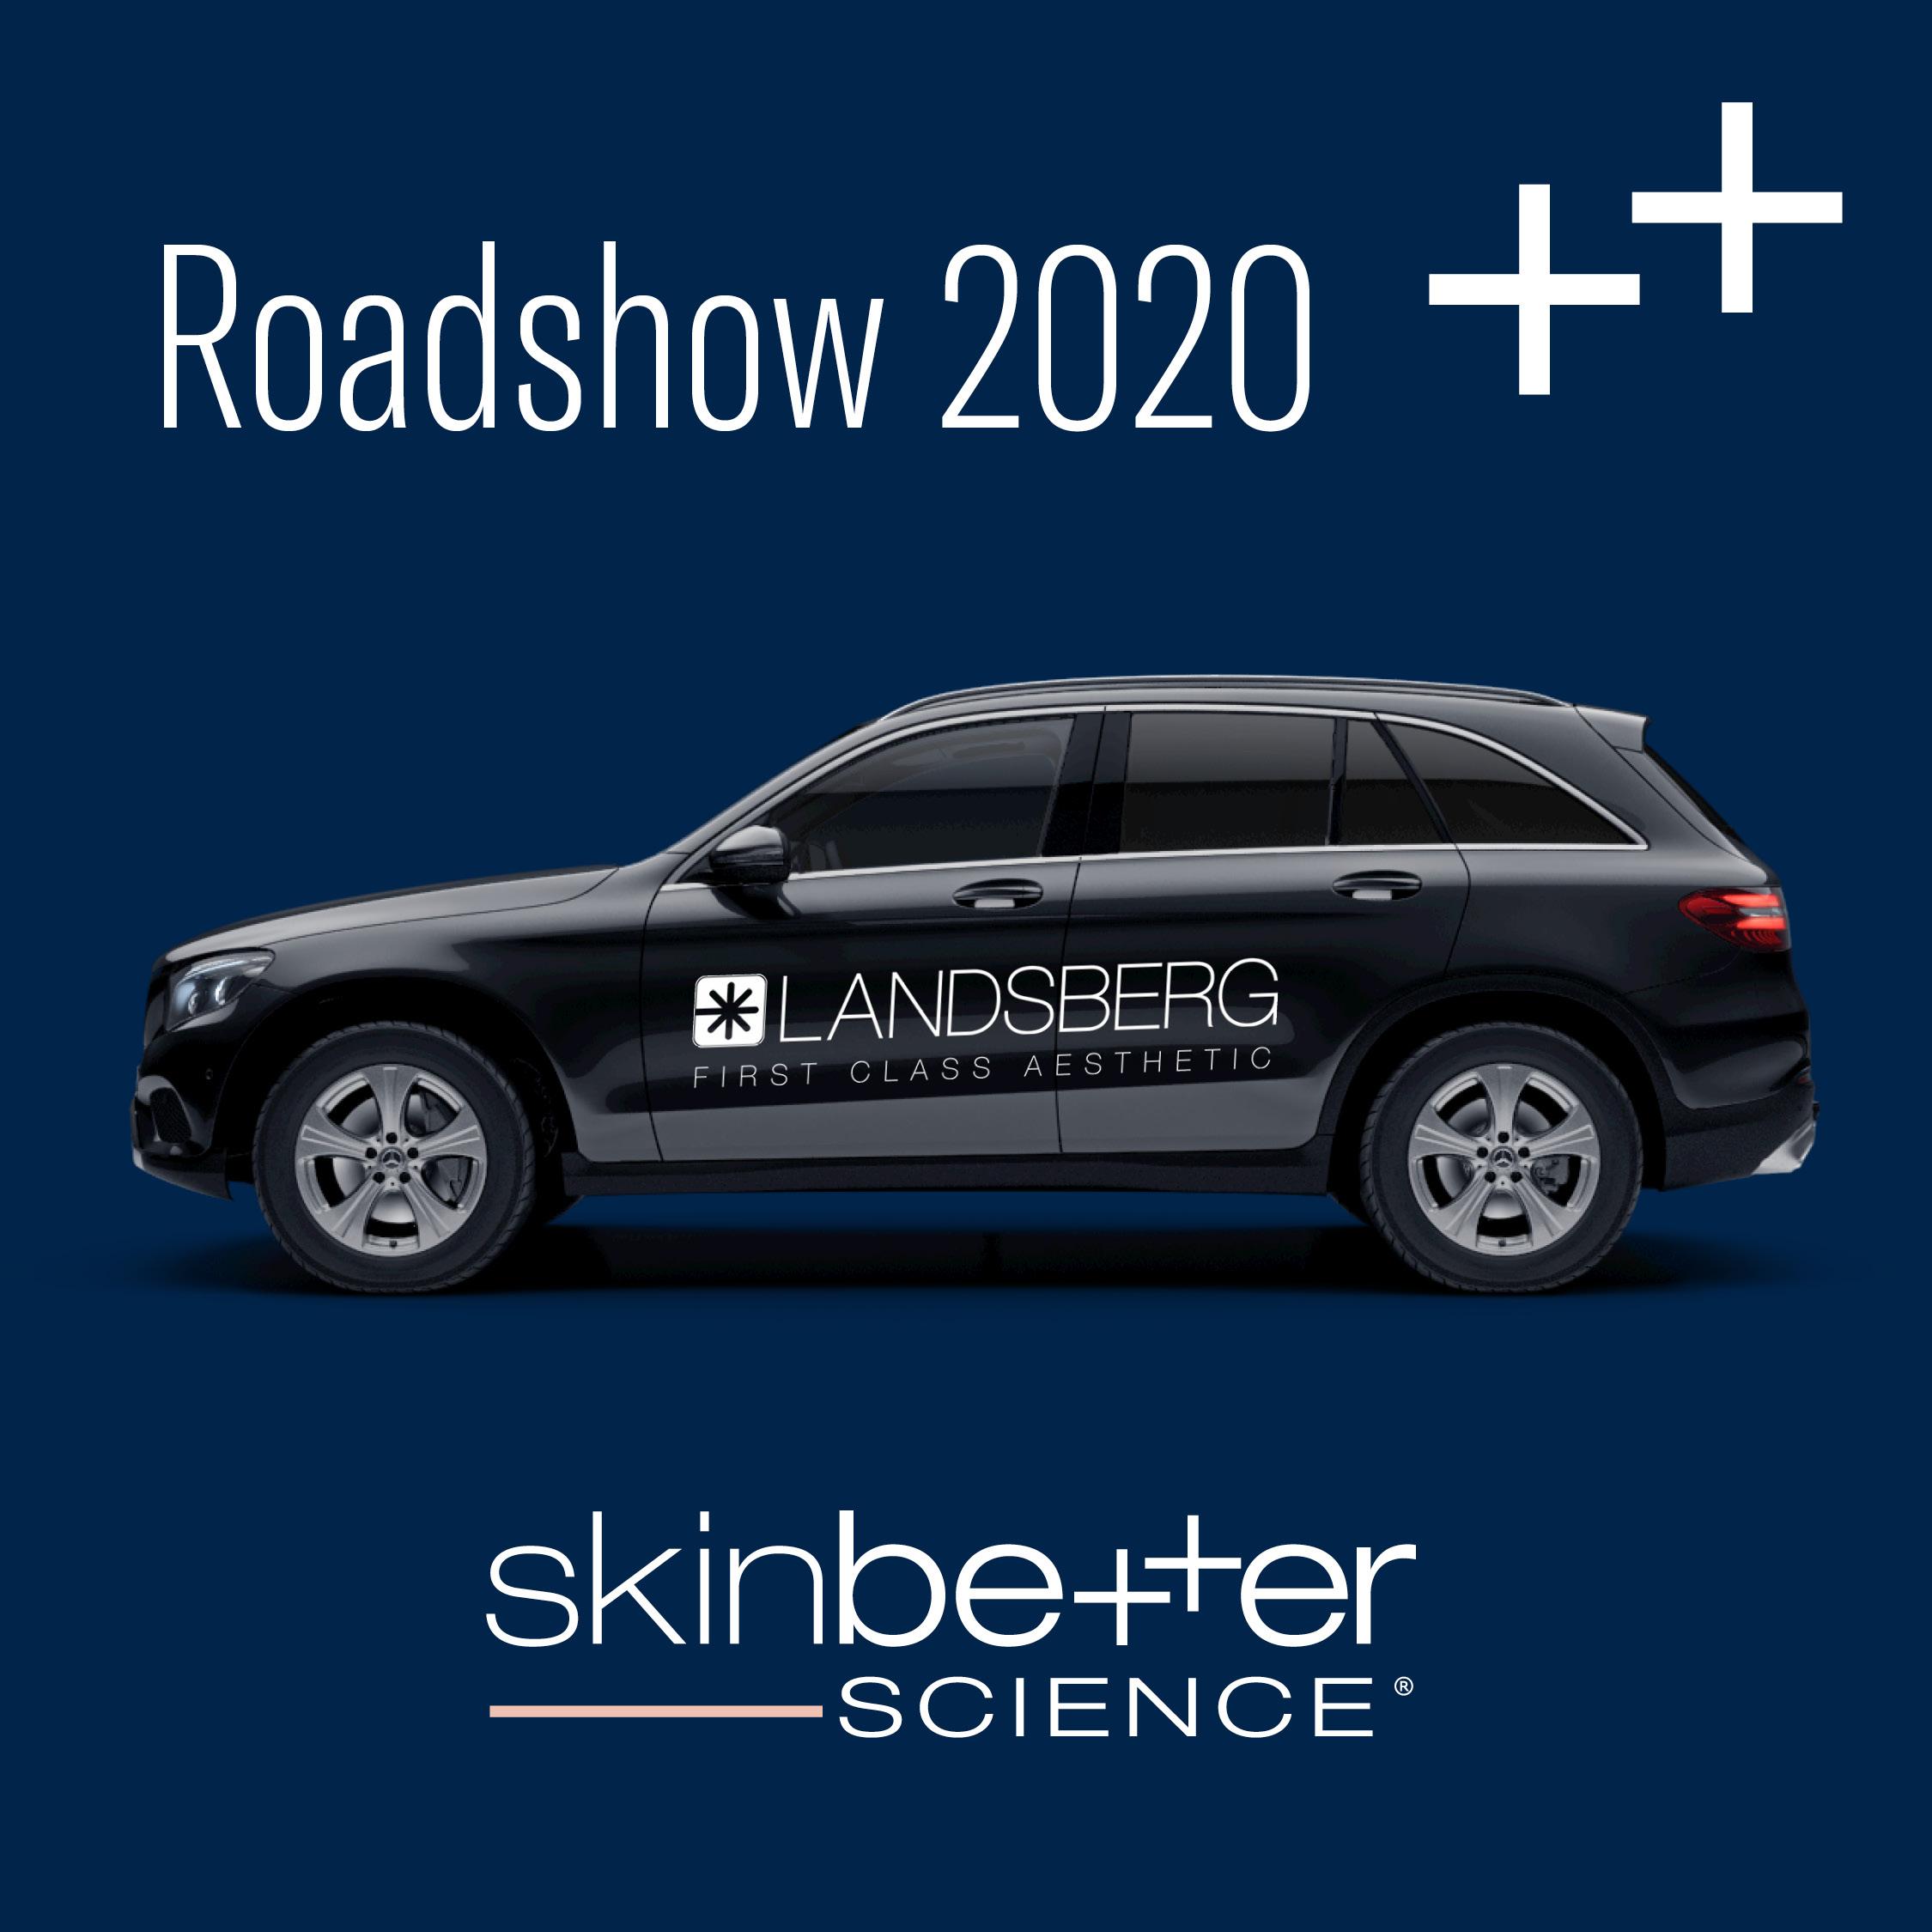 Die skinbetter science® Roadshow 2020